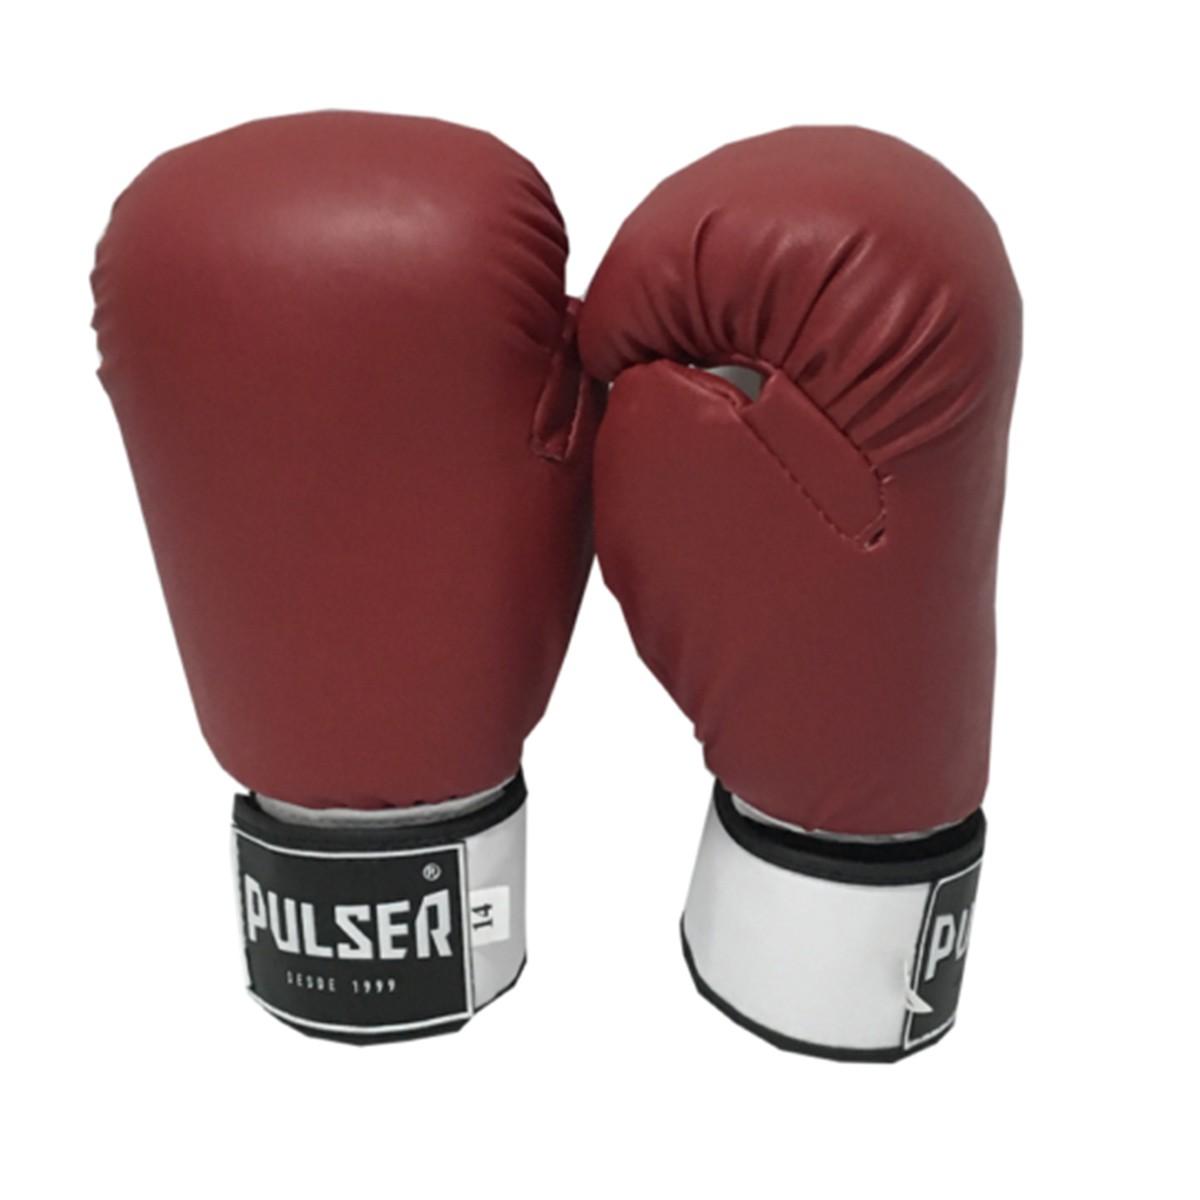 Kit de Muay Thai / Kickboxing 14oz - Vermelho - Pulser  - PRALUTA SHOP